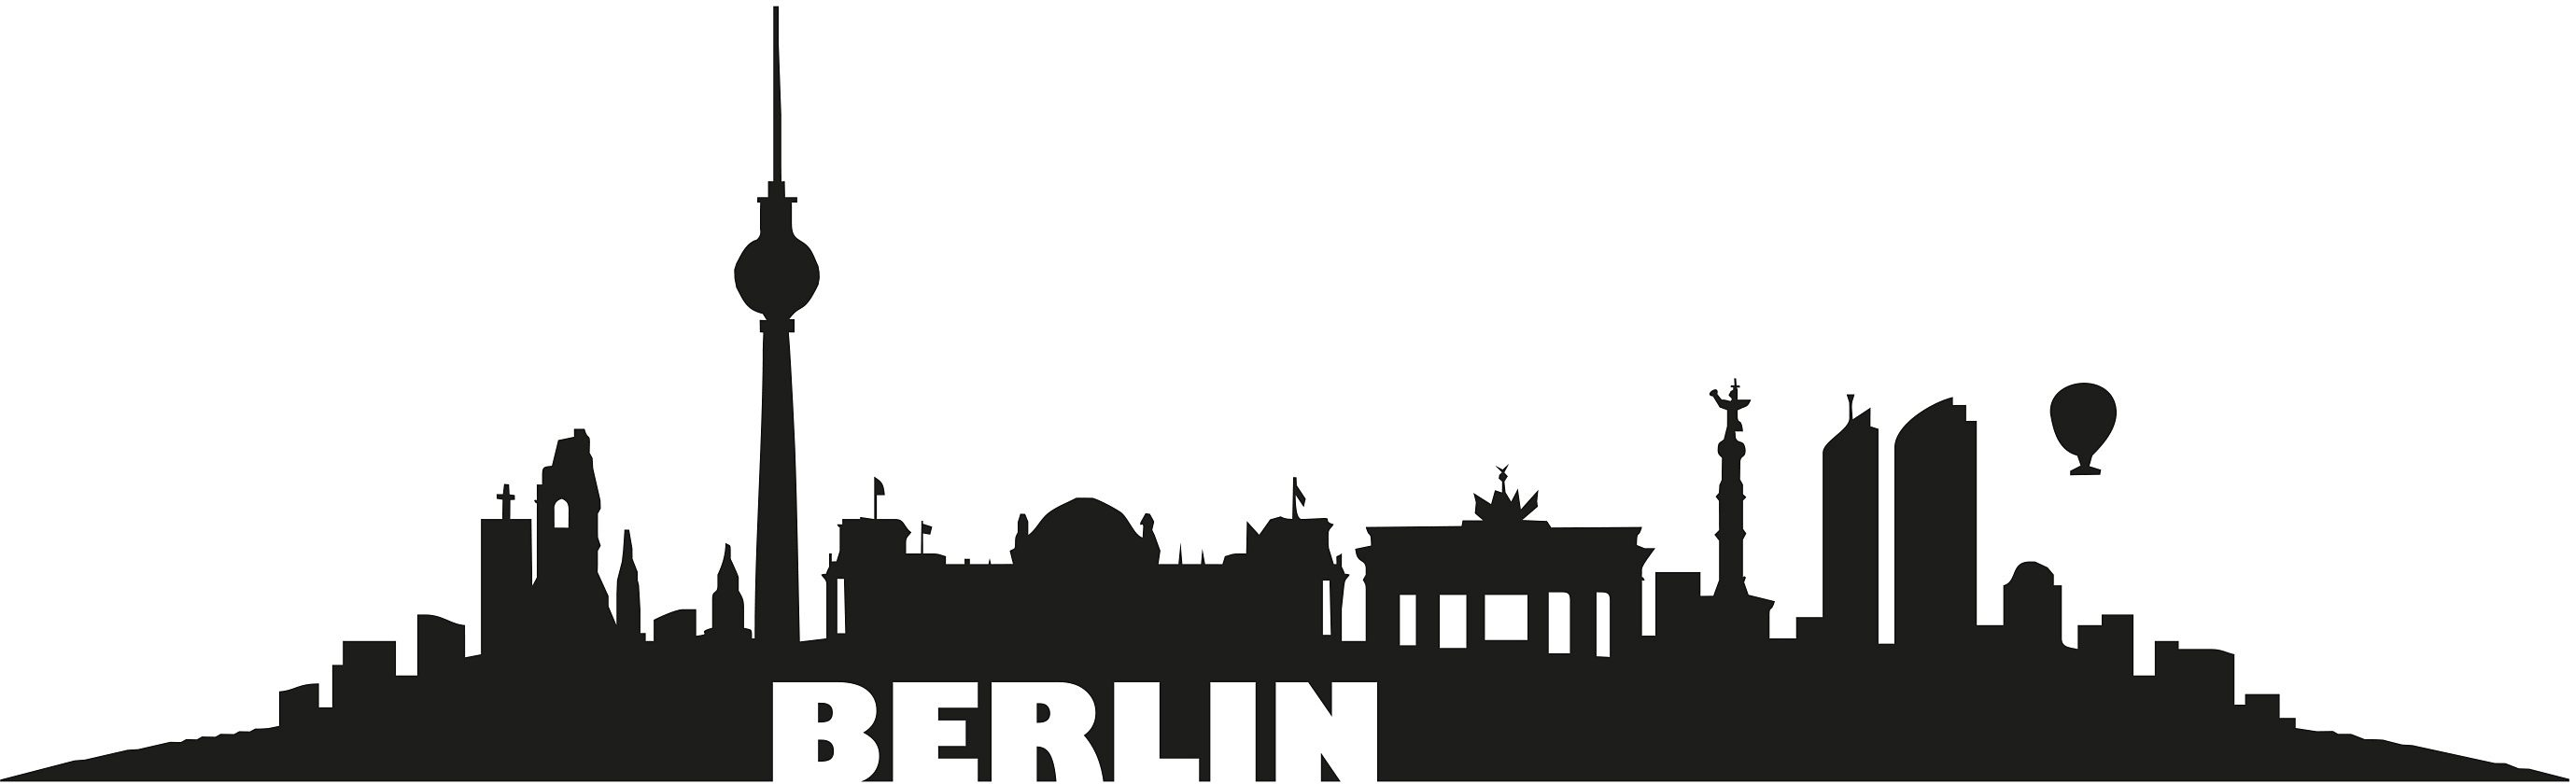 Home affaire Wandtattoo »Berlin Skyline« 120/36 cm | Dekoration > Wandtattoos > Wandtattoos | Schwarz | HOME AFFAIRE